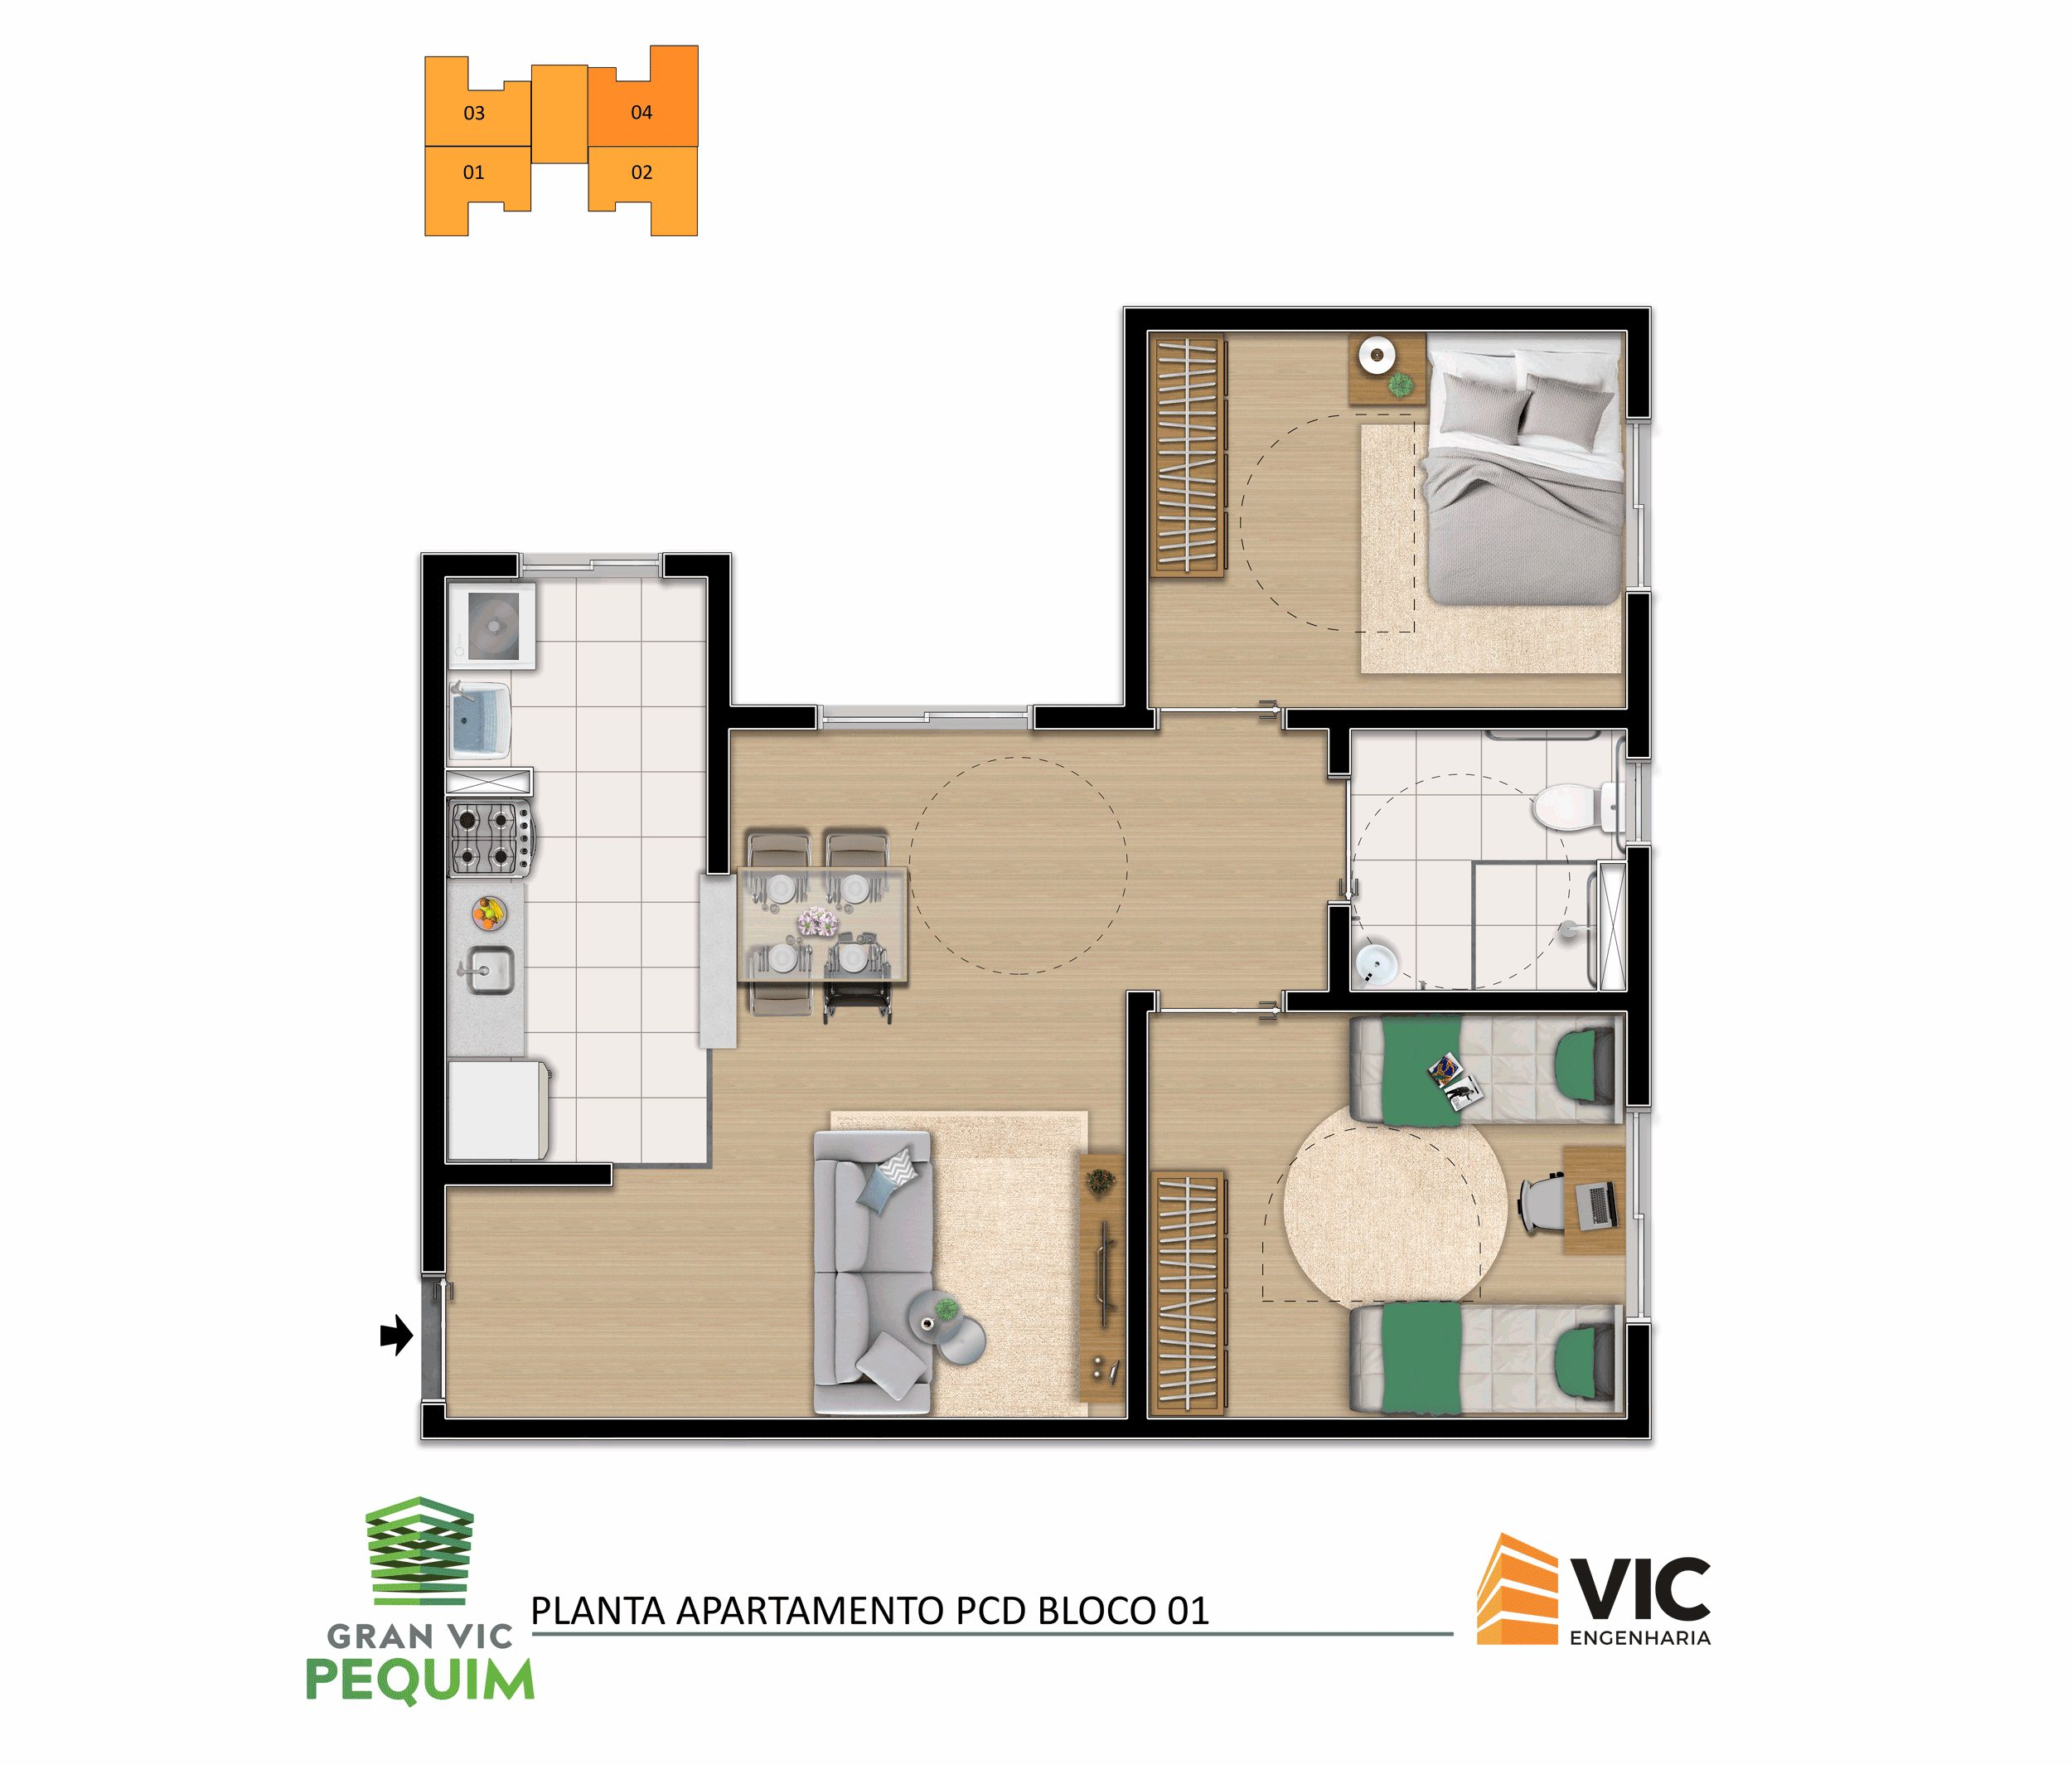 vic-engenharia-gran-vic-pequim-apartamento-pne-torre-1